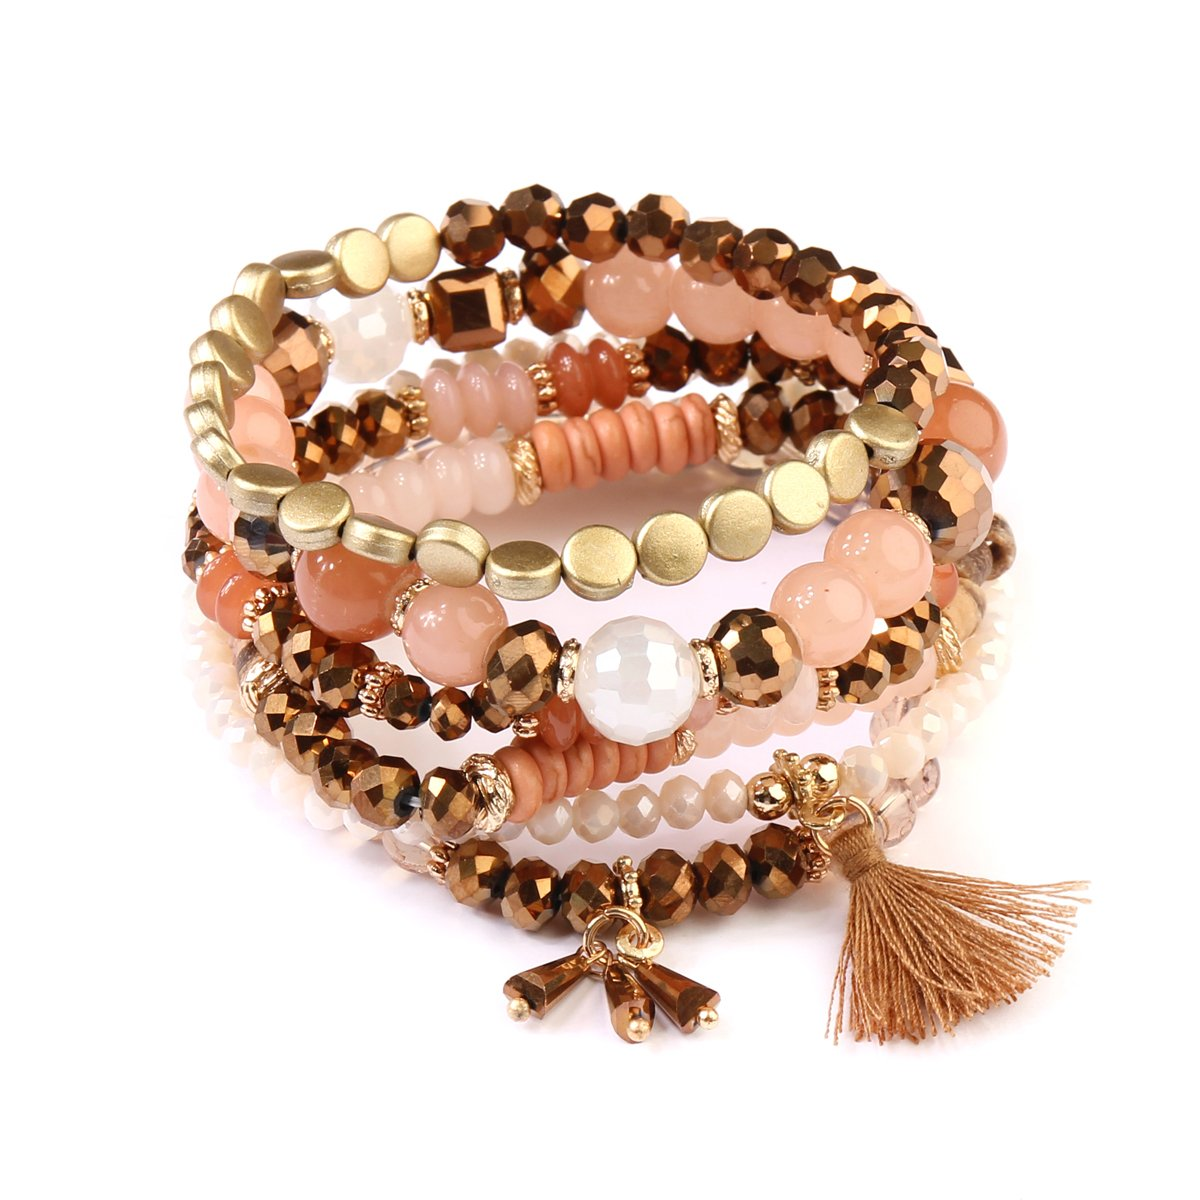 kpajewelry KPA Fashion Women's Multi Bead Tassel Stretch Bracelet - Colorful Beaded Layering Statement Bangles (Brown)